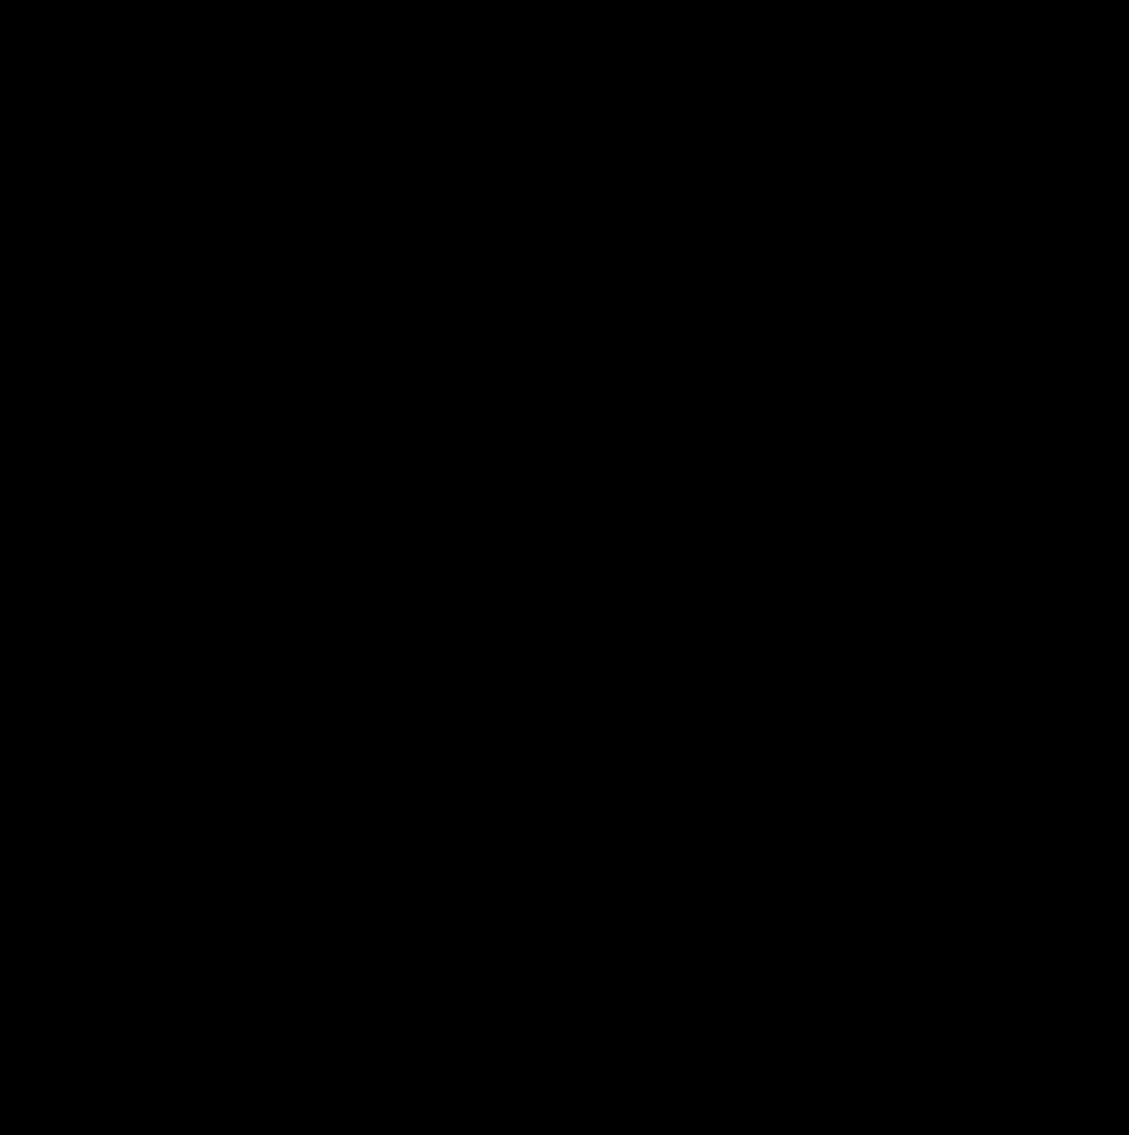 1129x1135 Planets Clipart Black Image